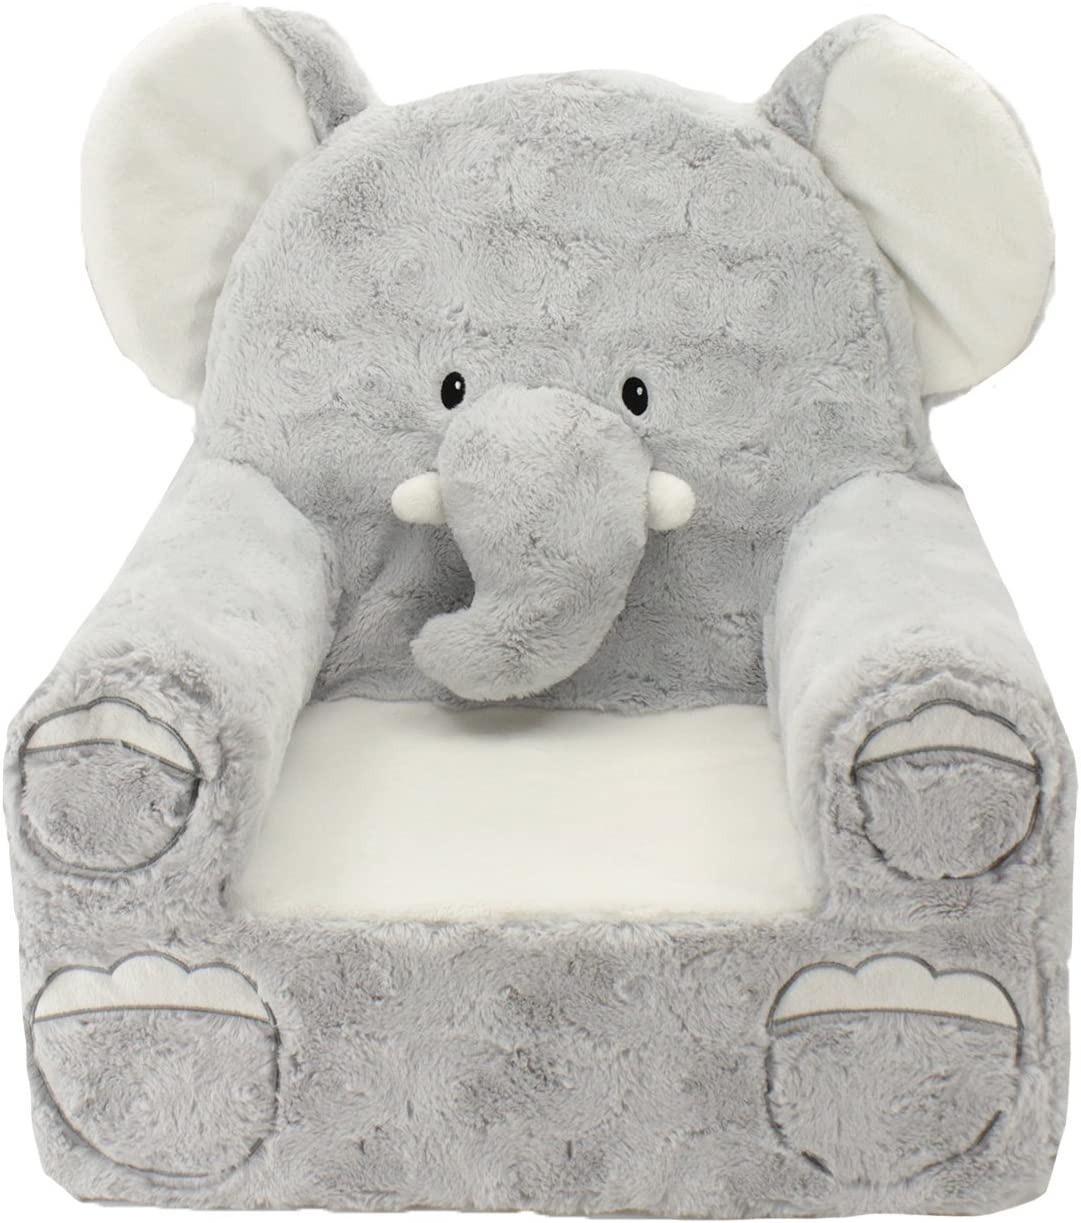 Amazon Com Animal Adventure Sweet Seats Grey Elephant Children S Plush Chair Toys Games